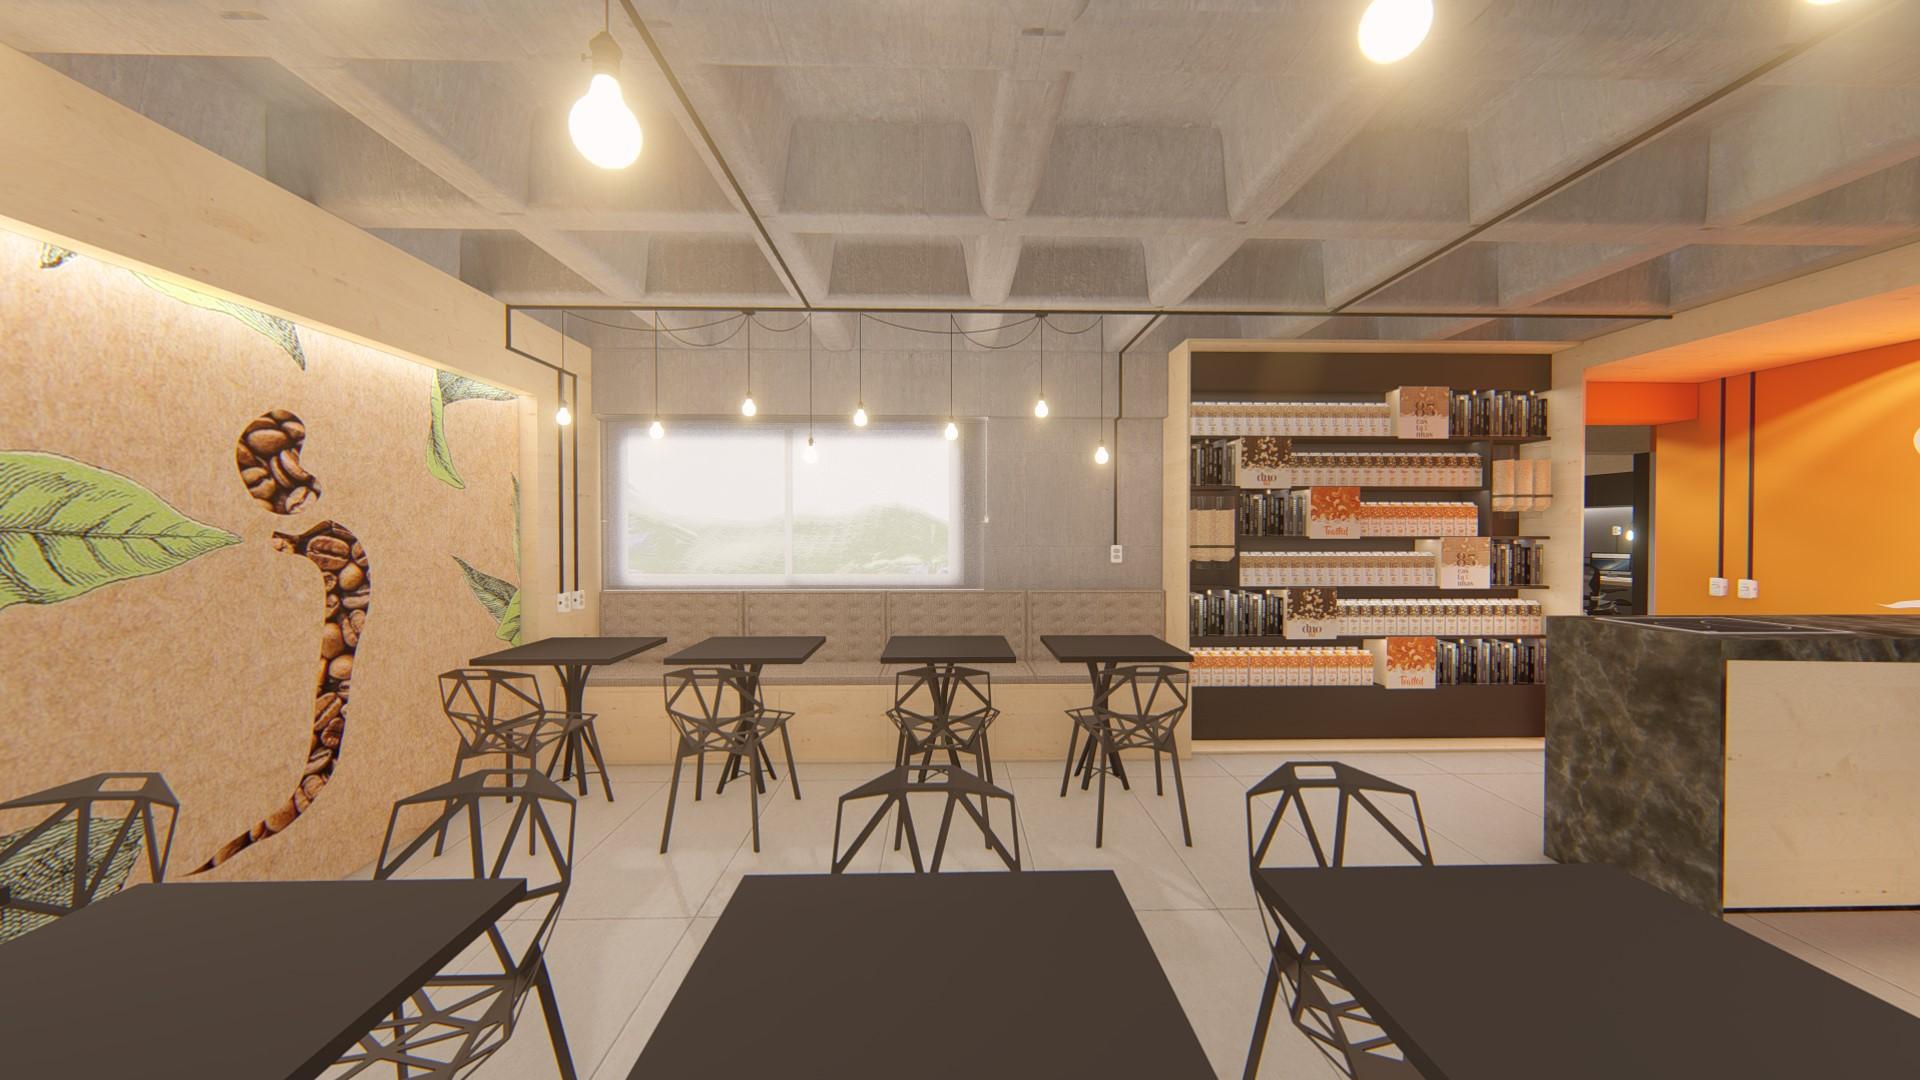 projeto-arquitetonico-cajueiro-duo-arquitetura-03.jpg